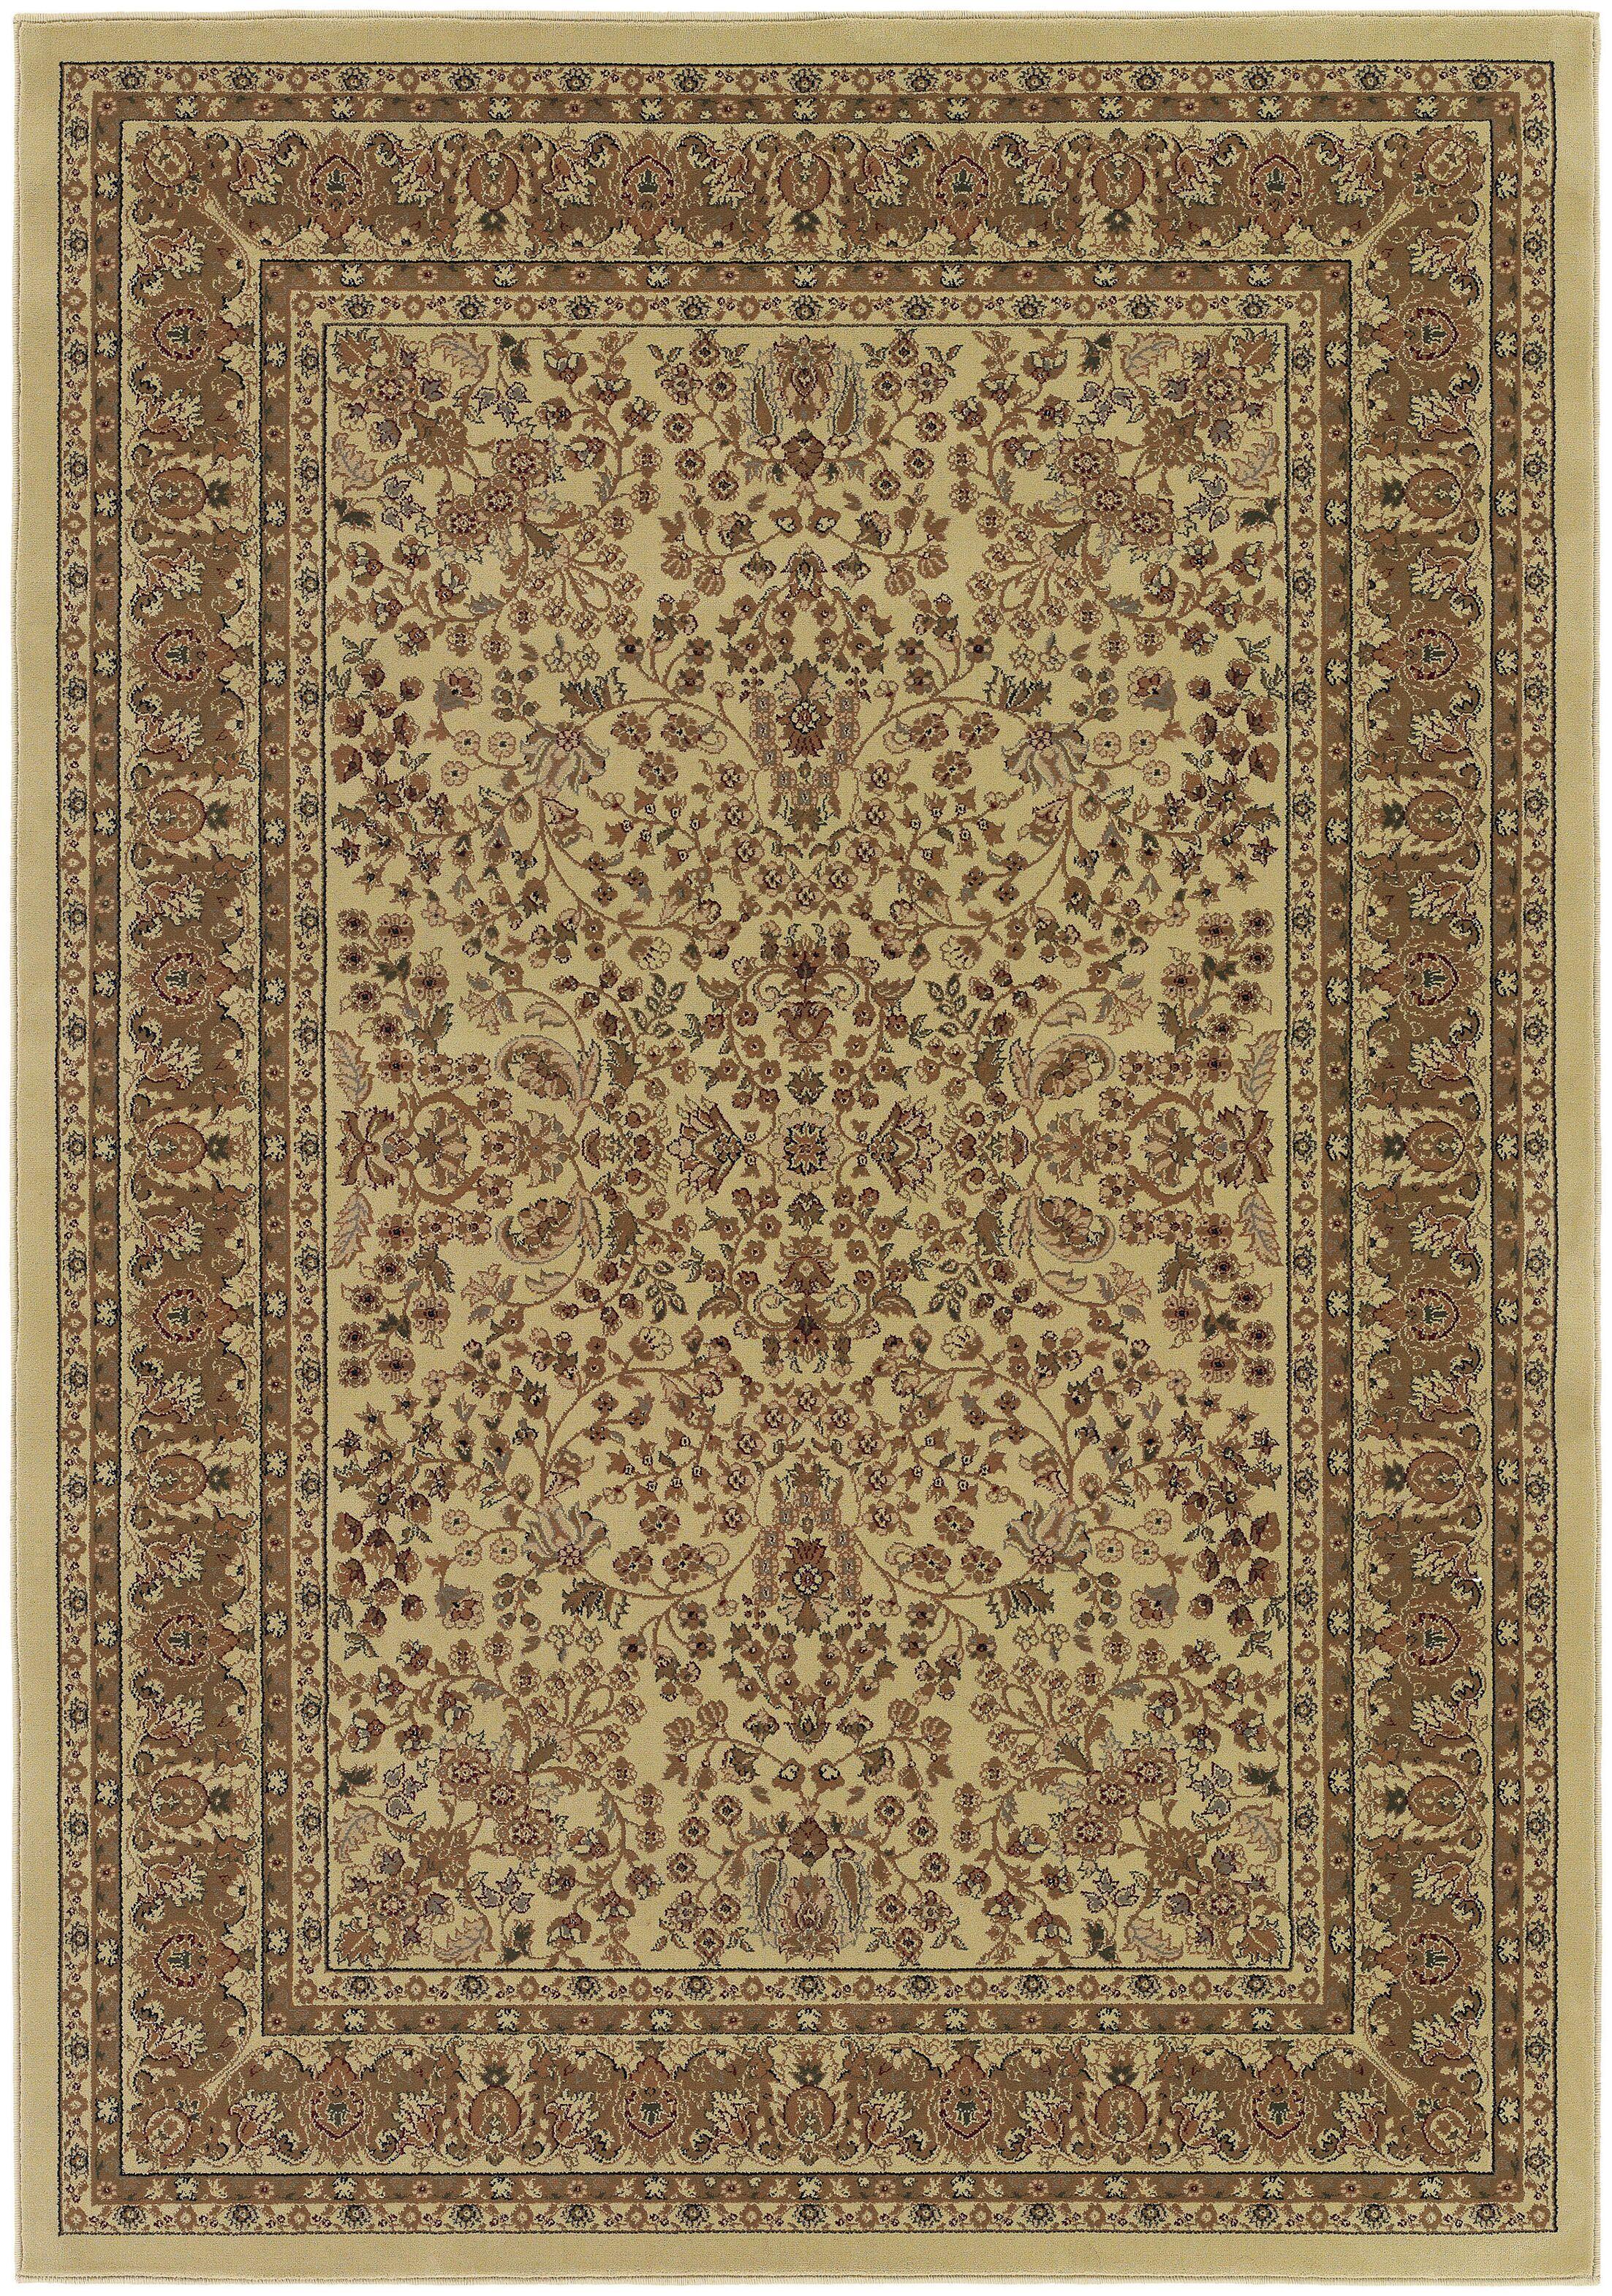 Belcourt Floral Beige/Brown Area Rug Rug Size: Rectangle 5'3